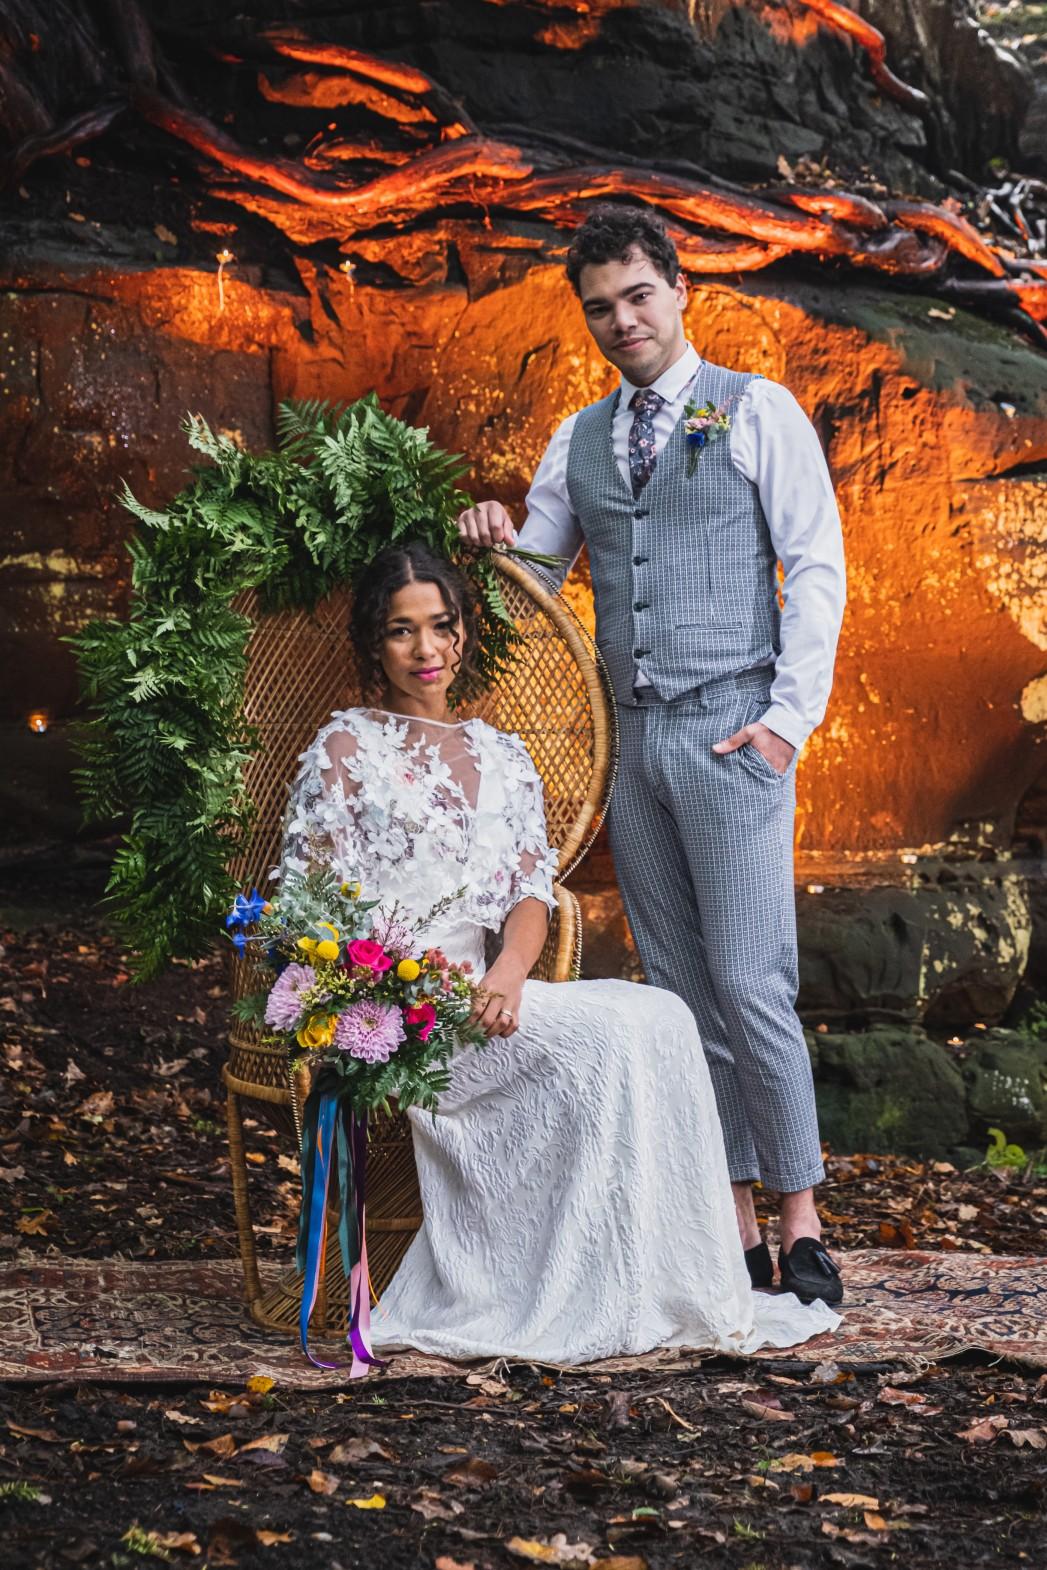 colourful micro wedding at patricks barn - unique wedding venue - boho wedding - sussex wedding - unconventional wedding